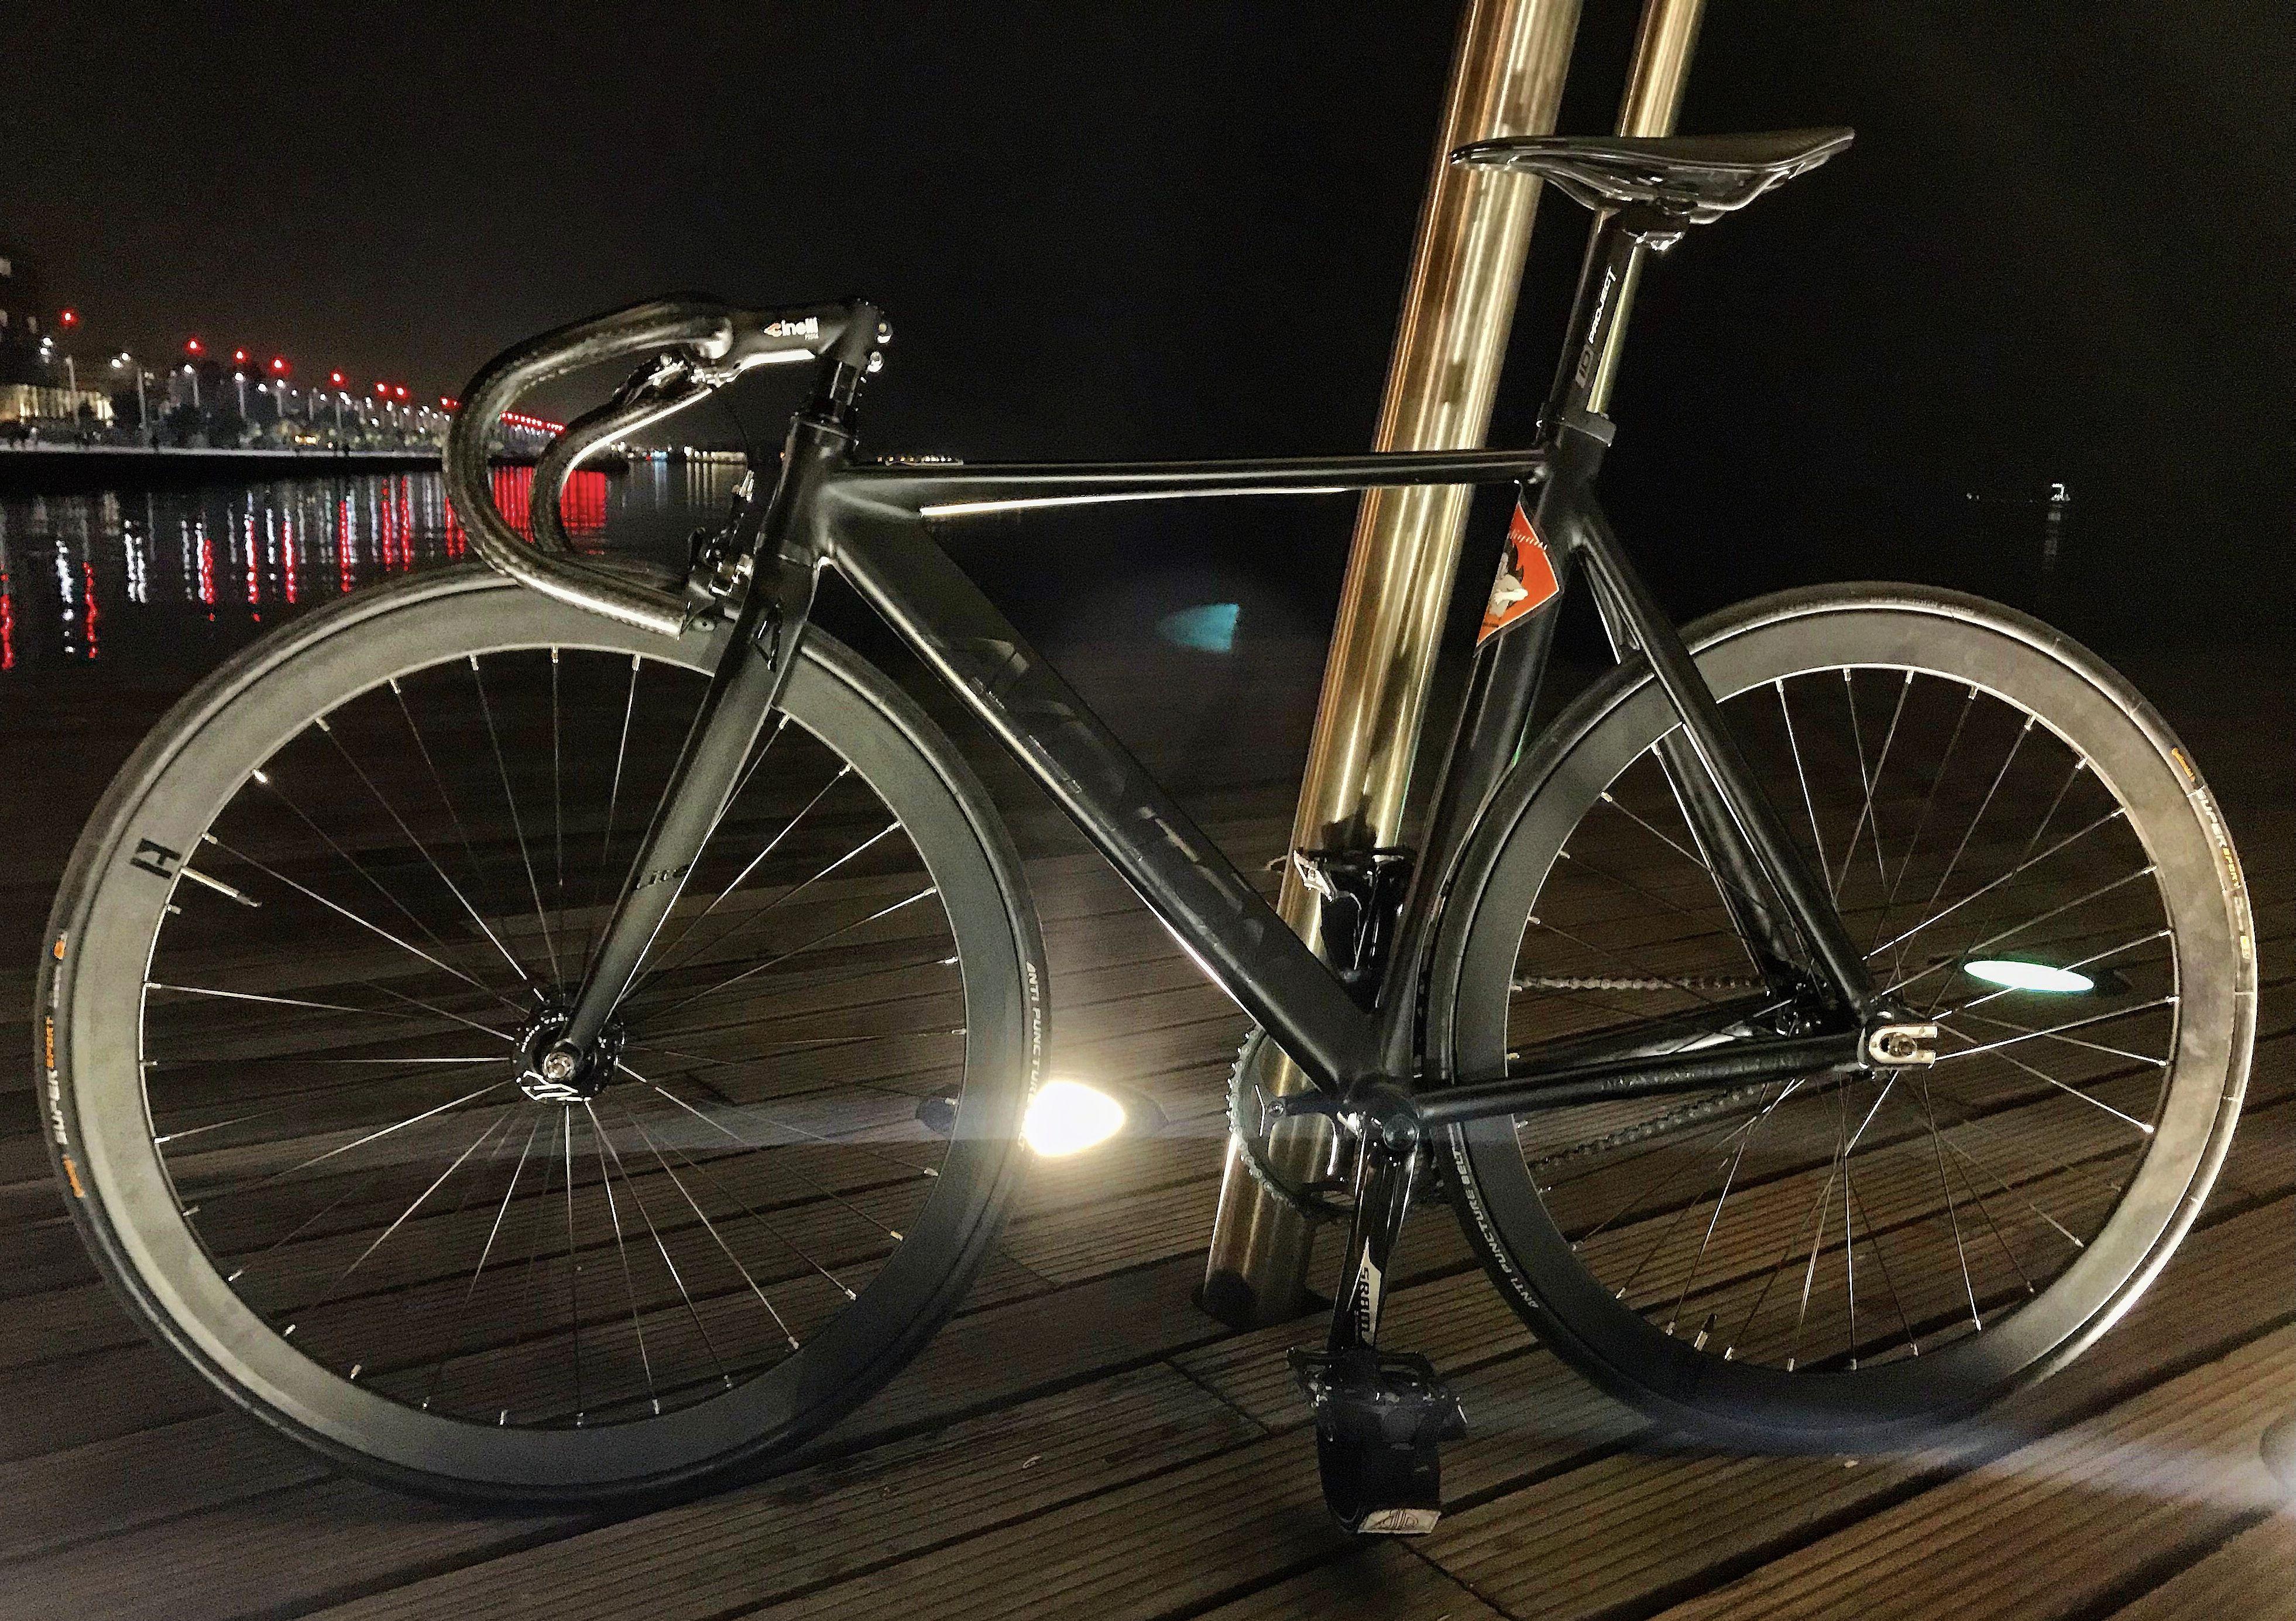 Aventon Mataro Low Black Mataro Road Bikes Fixed Gear Bike